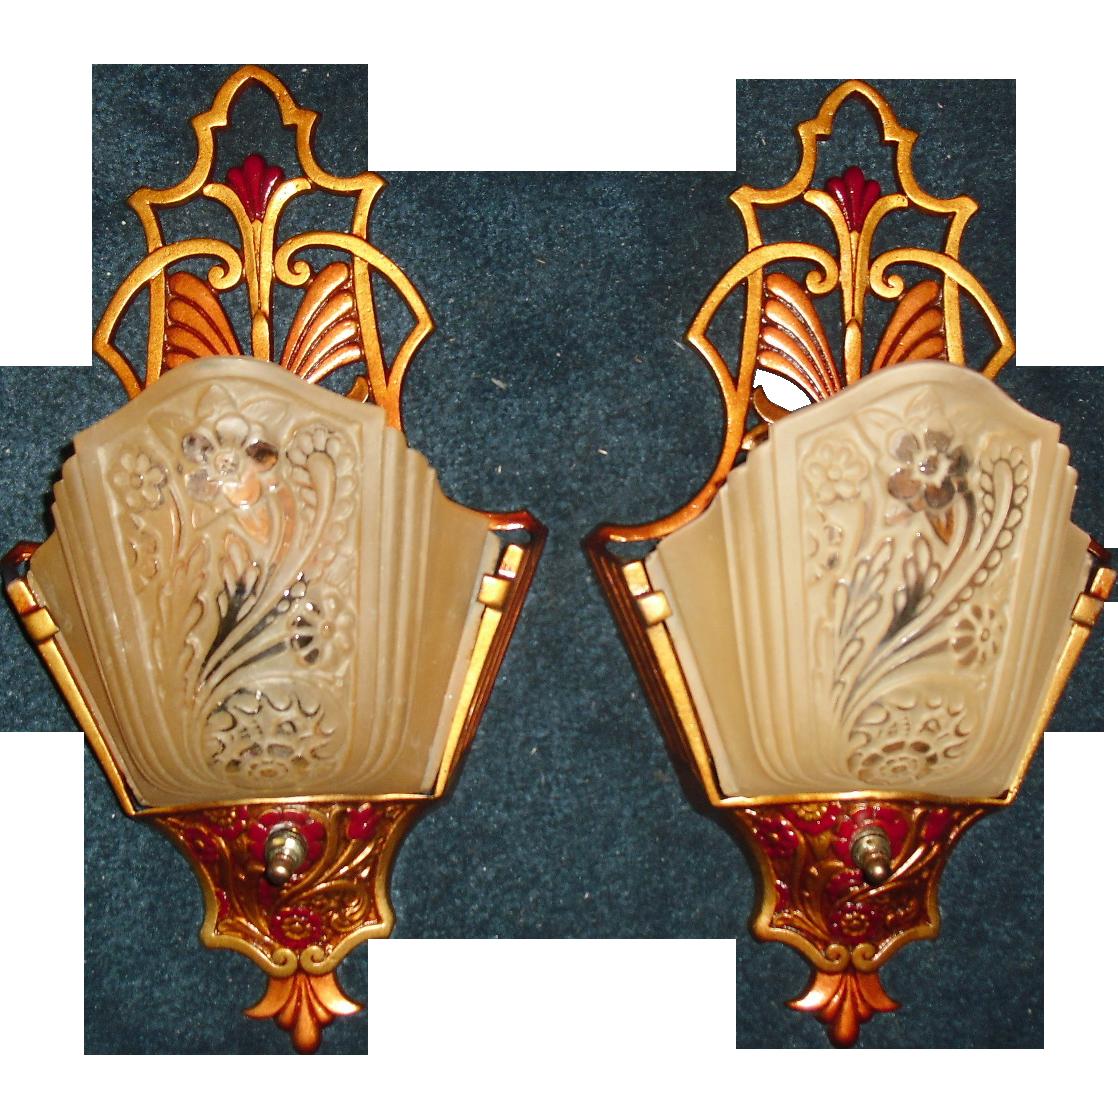 Art Deco Slip Shade Wall Sconces : Art Deco Slip Shade Wall Sconces w Consolidated Glass Shades